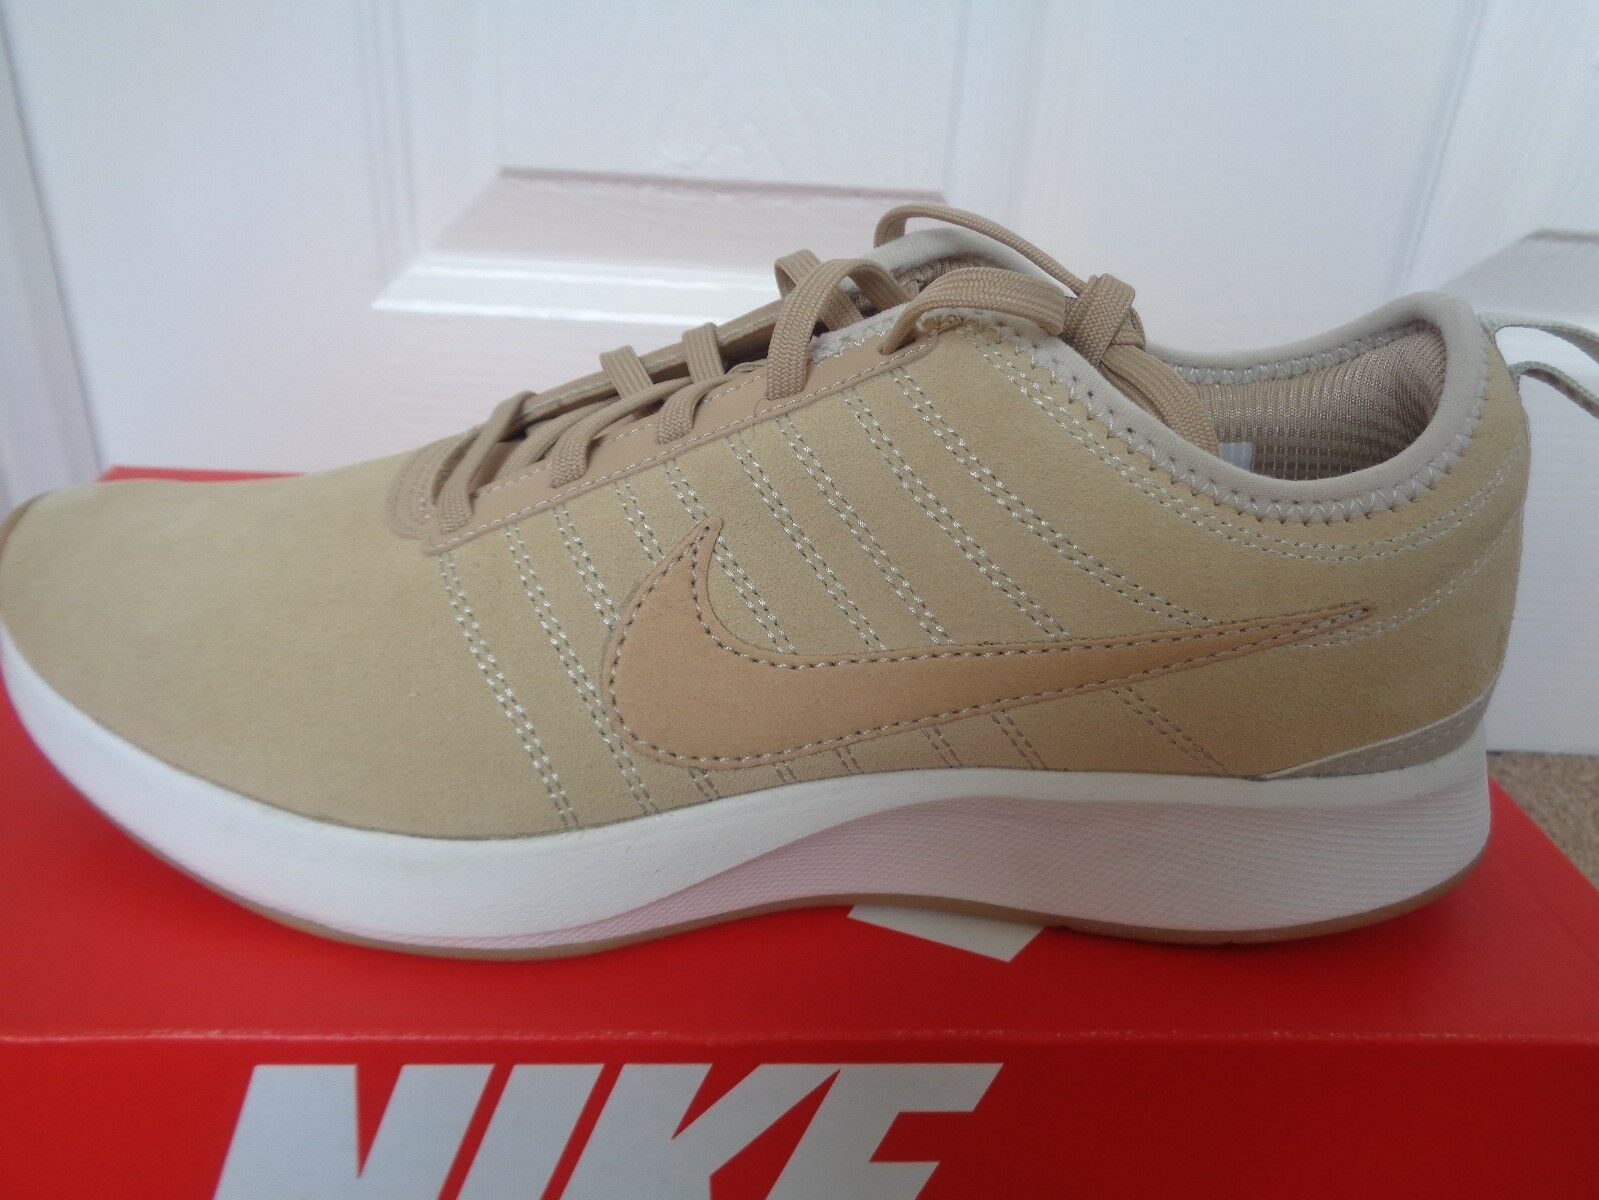 Nike Dualtone Racer SE shoes trainers 940418 200 uk 5.5 eu 39 us 8 NEW IN BOX